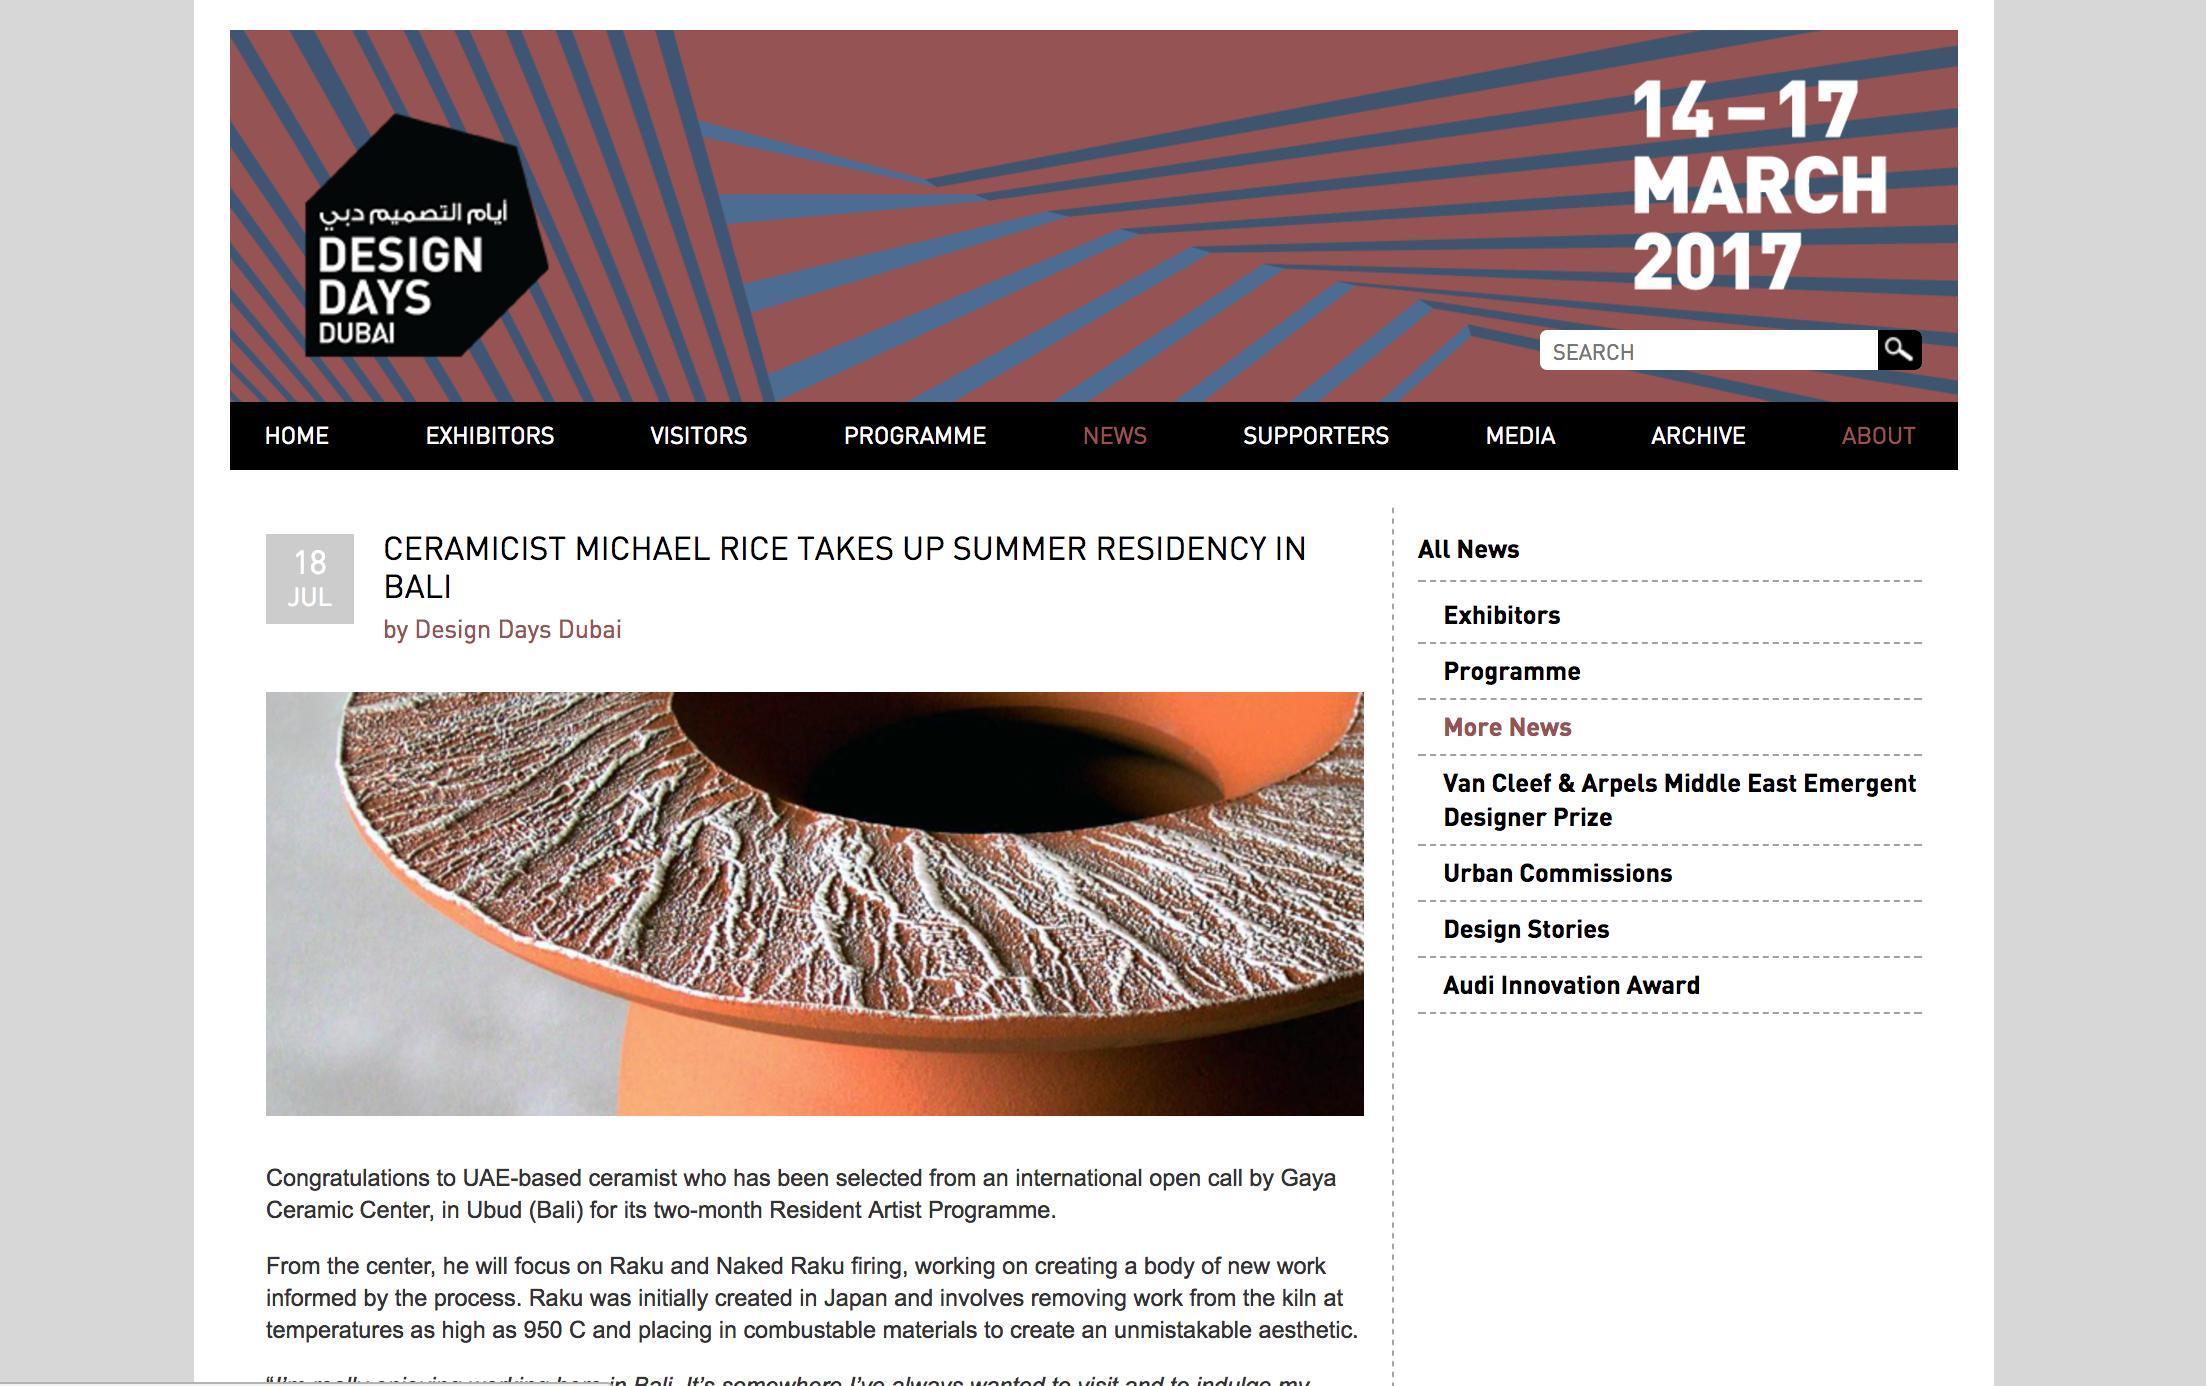 Featured on the DesignDaysDubai website   http://www.designdaysdubai.ae/news/more-news/2017/07/ceramicist-michael-rice-takes-up-summer-residency-in-bali/